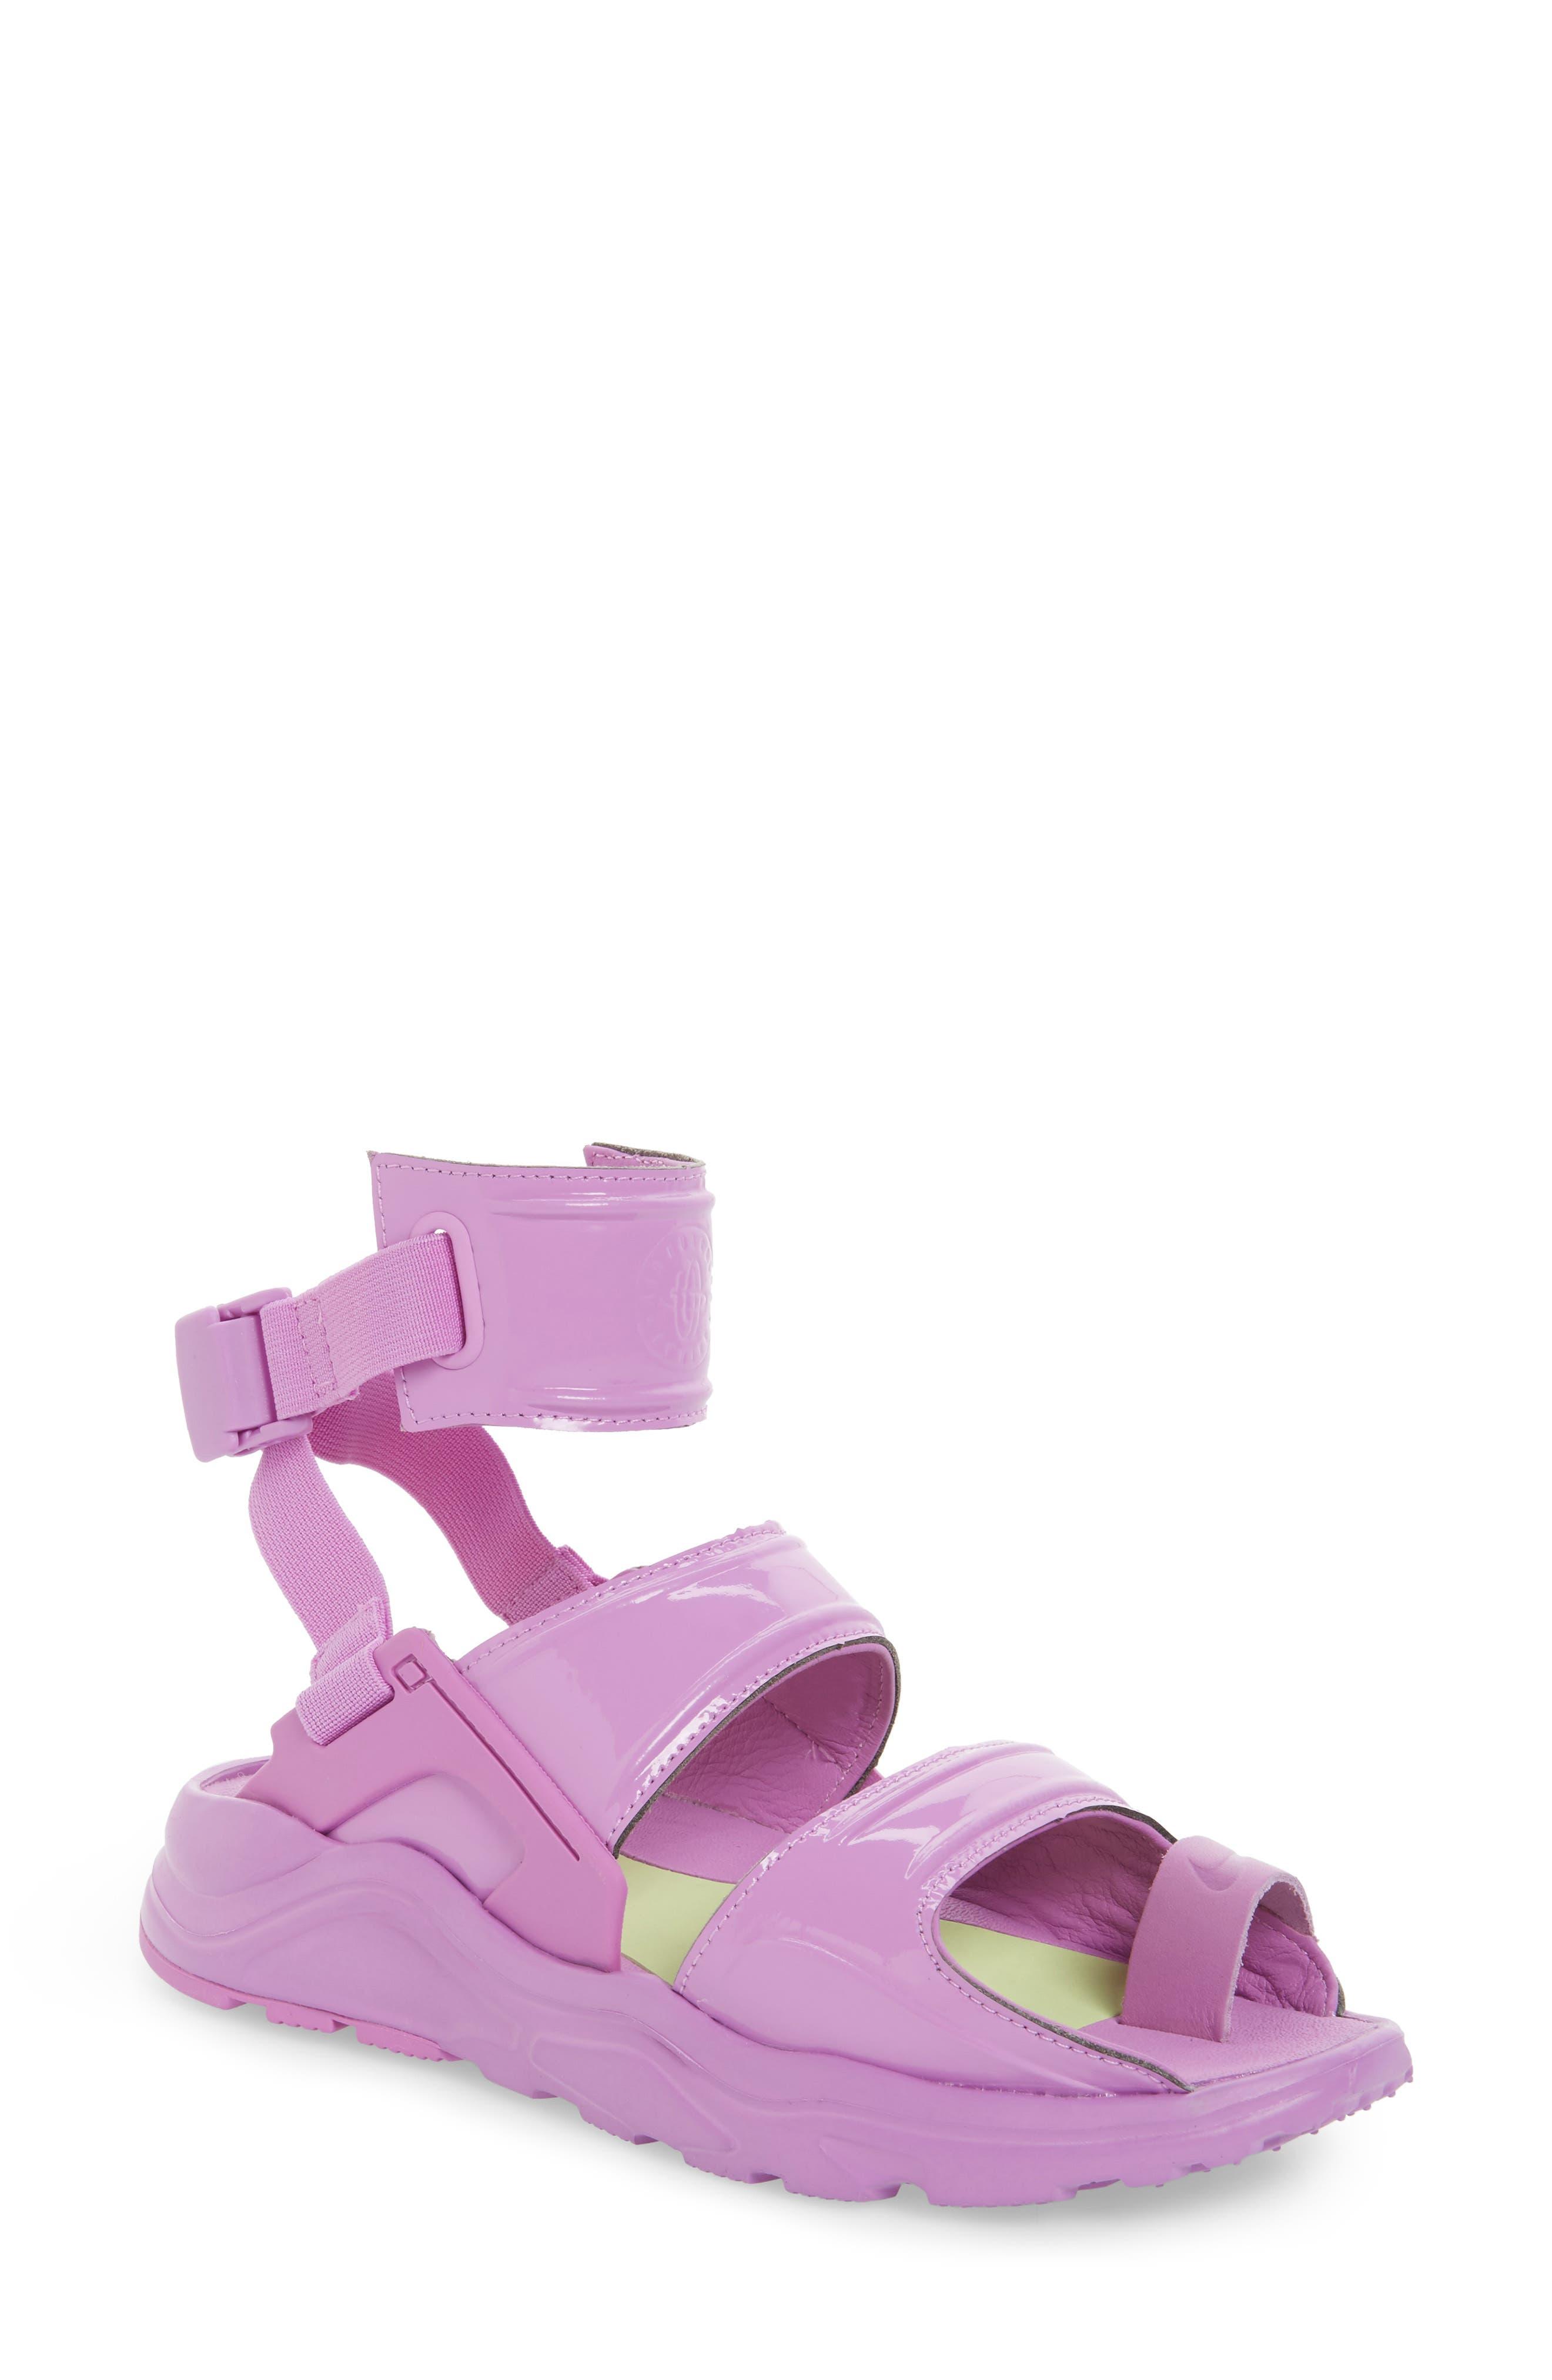 Nike Air Huarache Gladiator Sandal (Women)